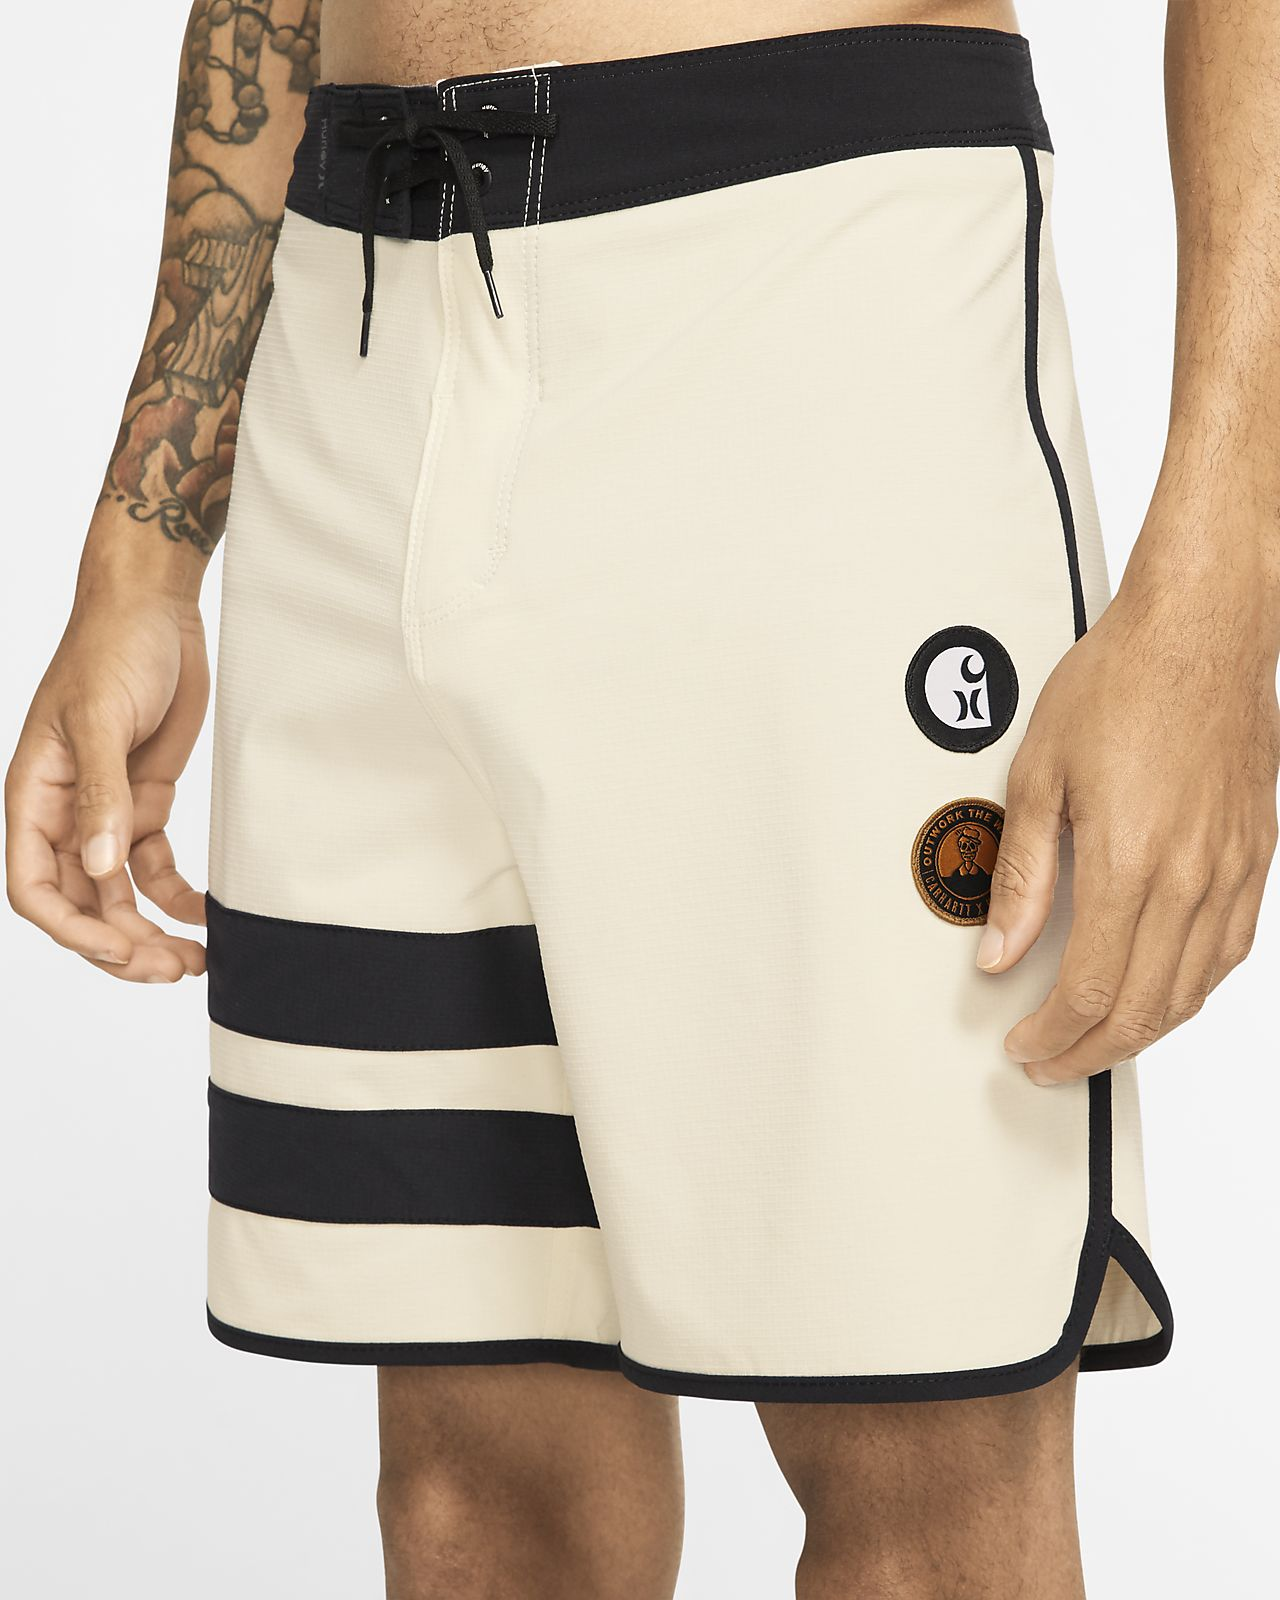 Shorts de playa de 46 cm para hombre Hurley Phantom x Carhartt Built